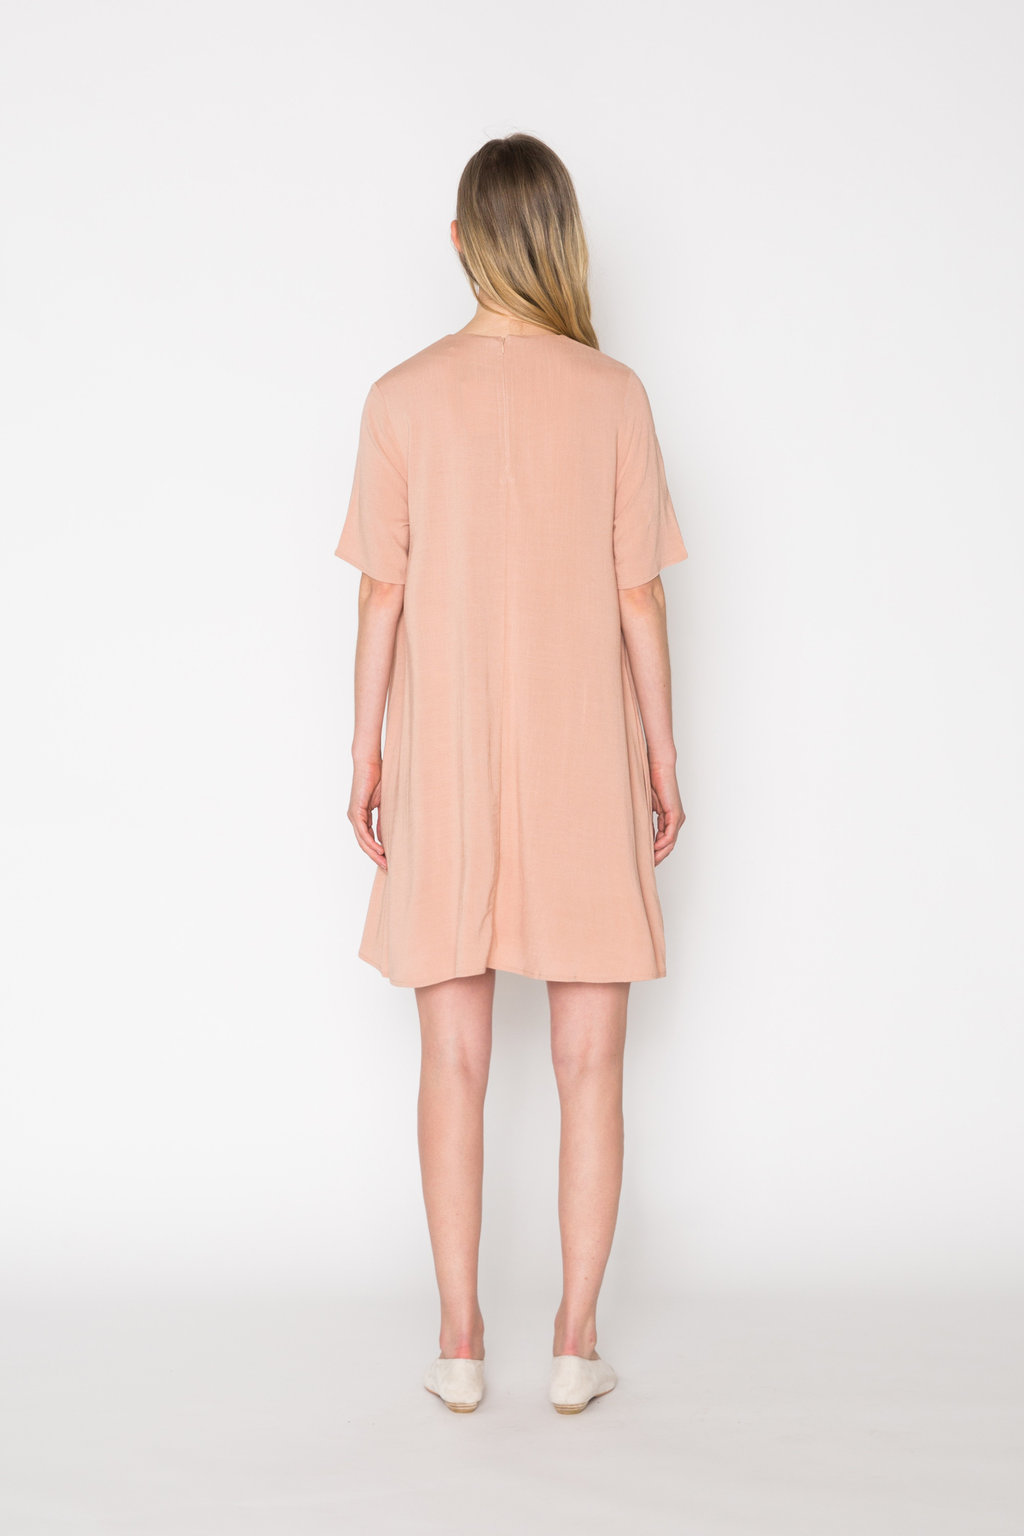 Dress 2143 Blush 4